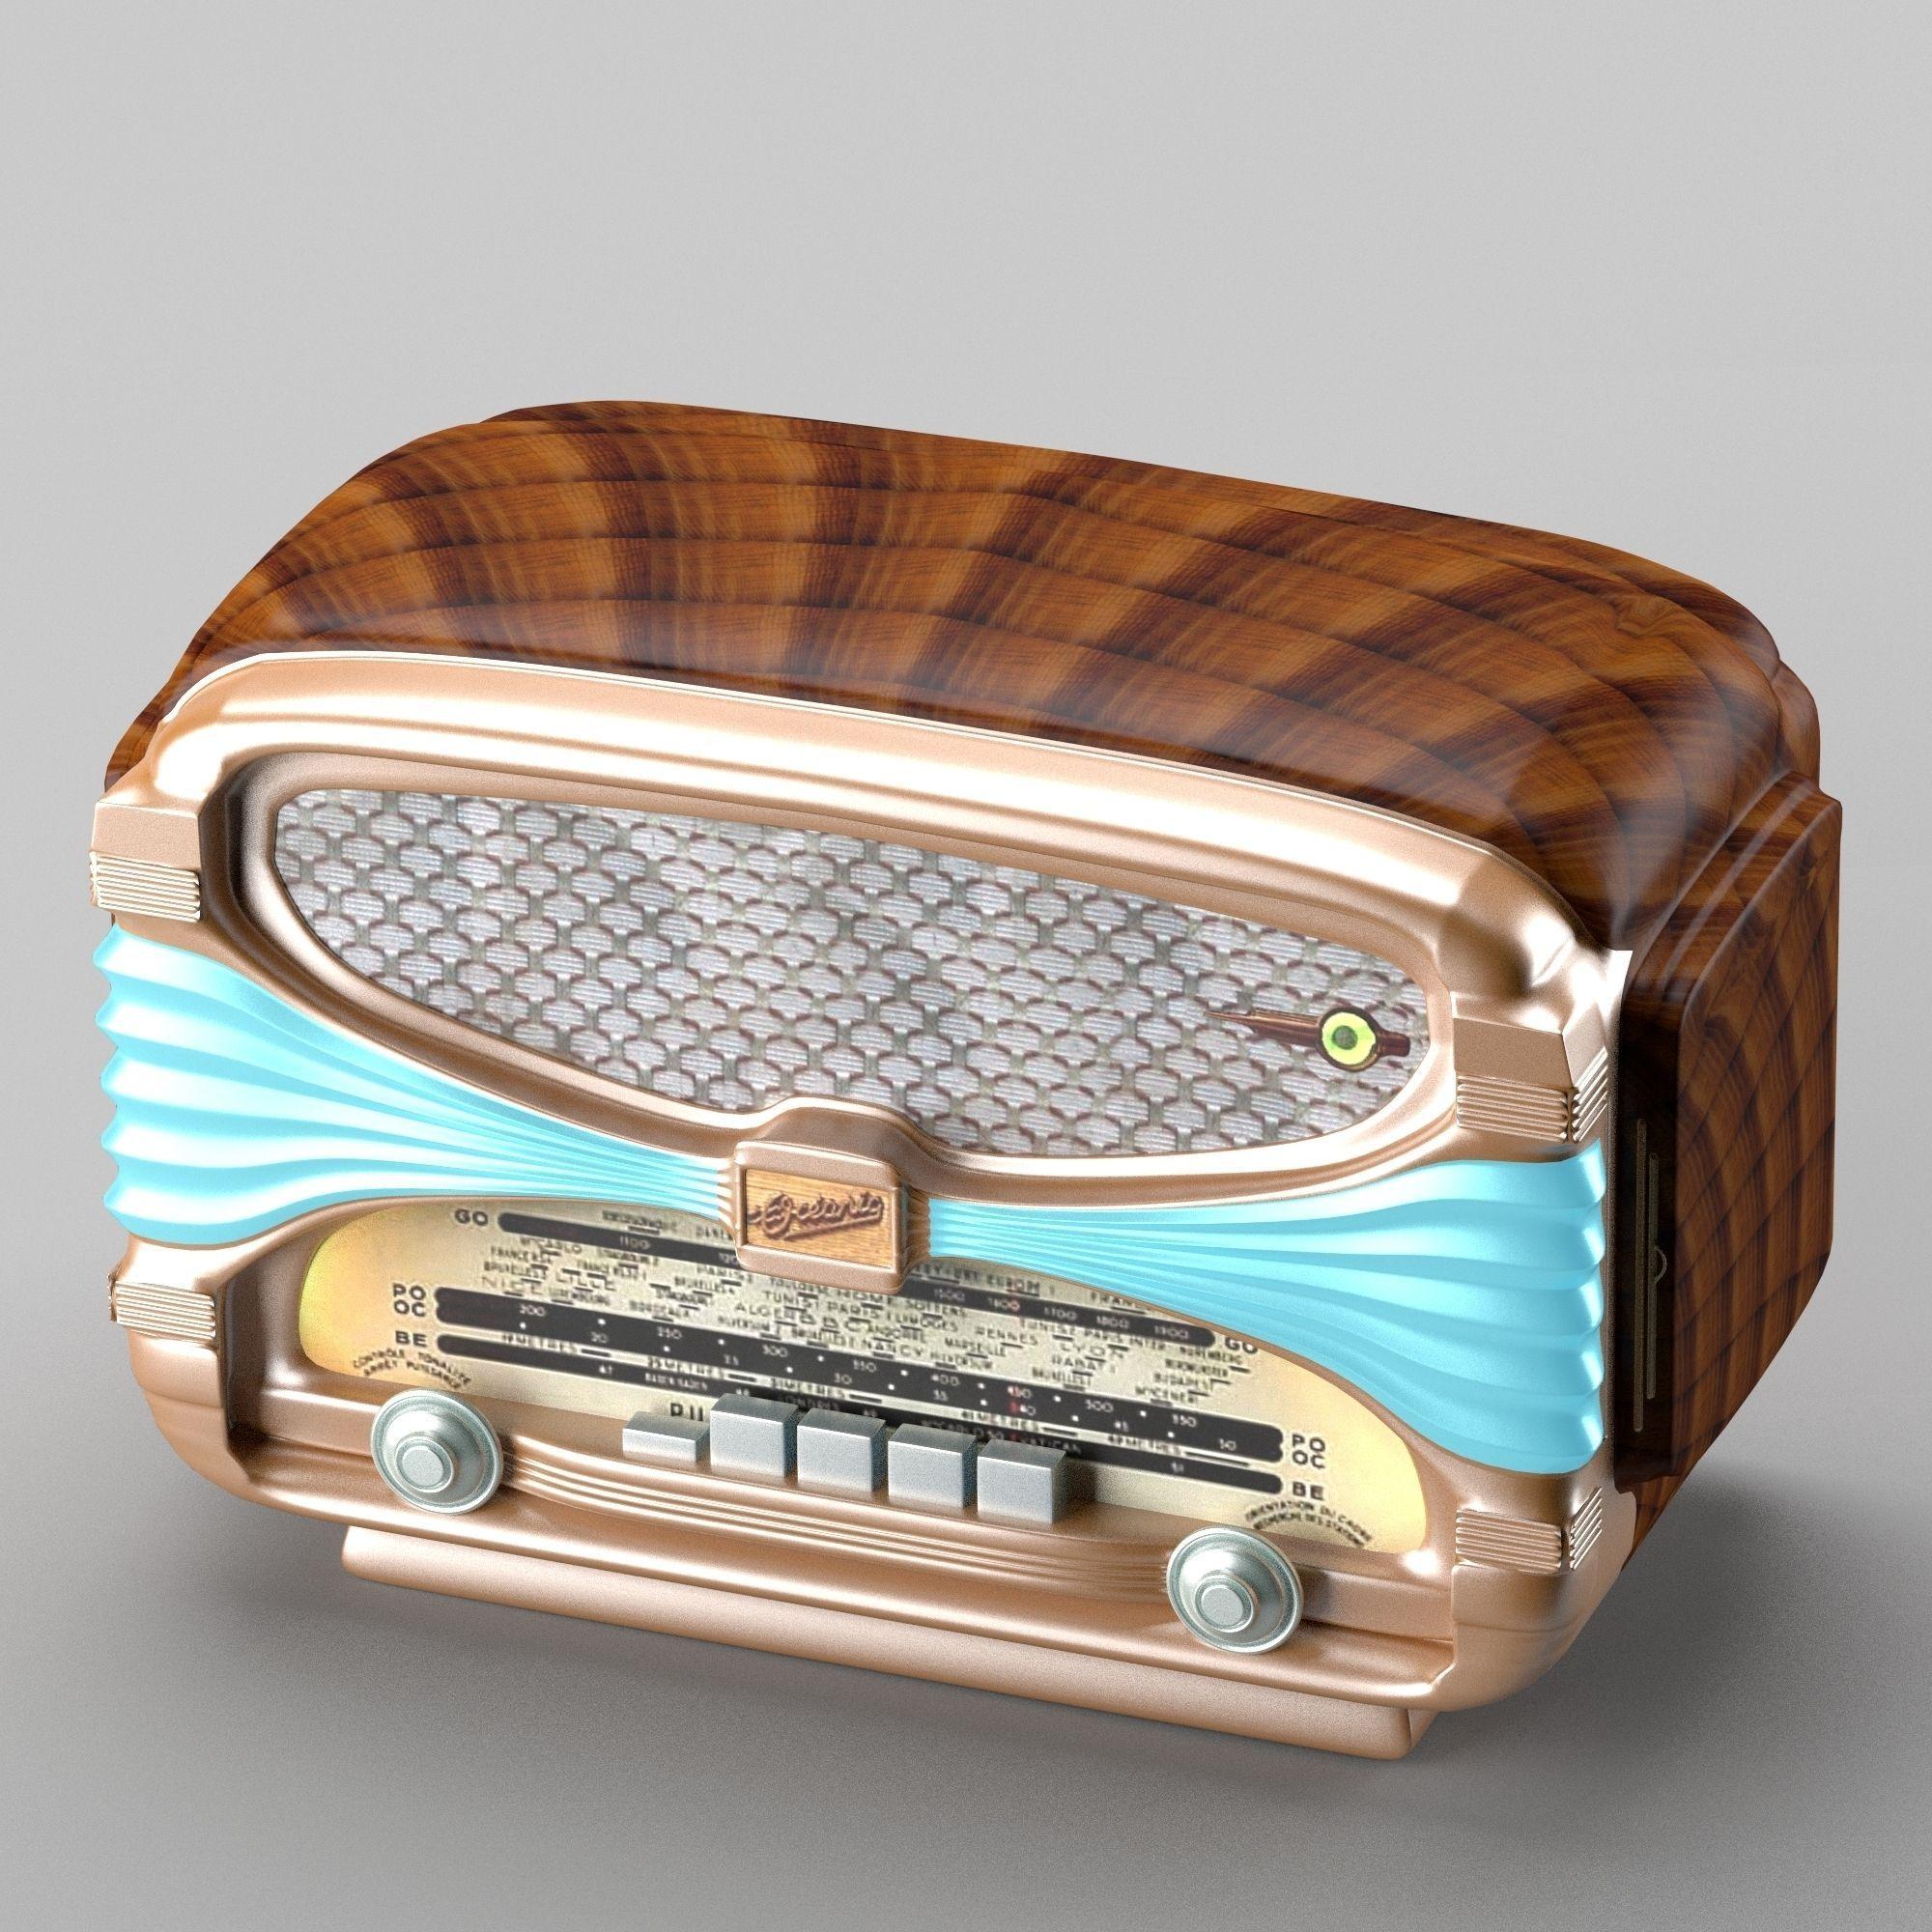 Retro radio in art deco style